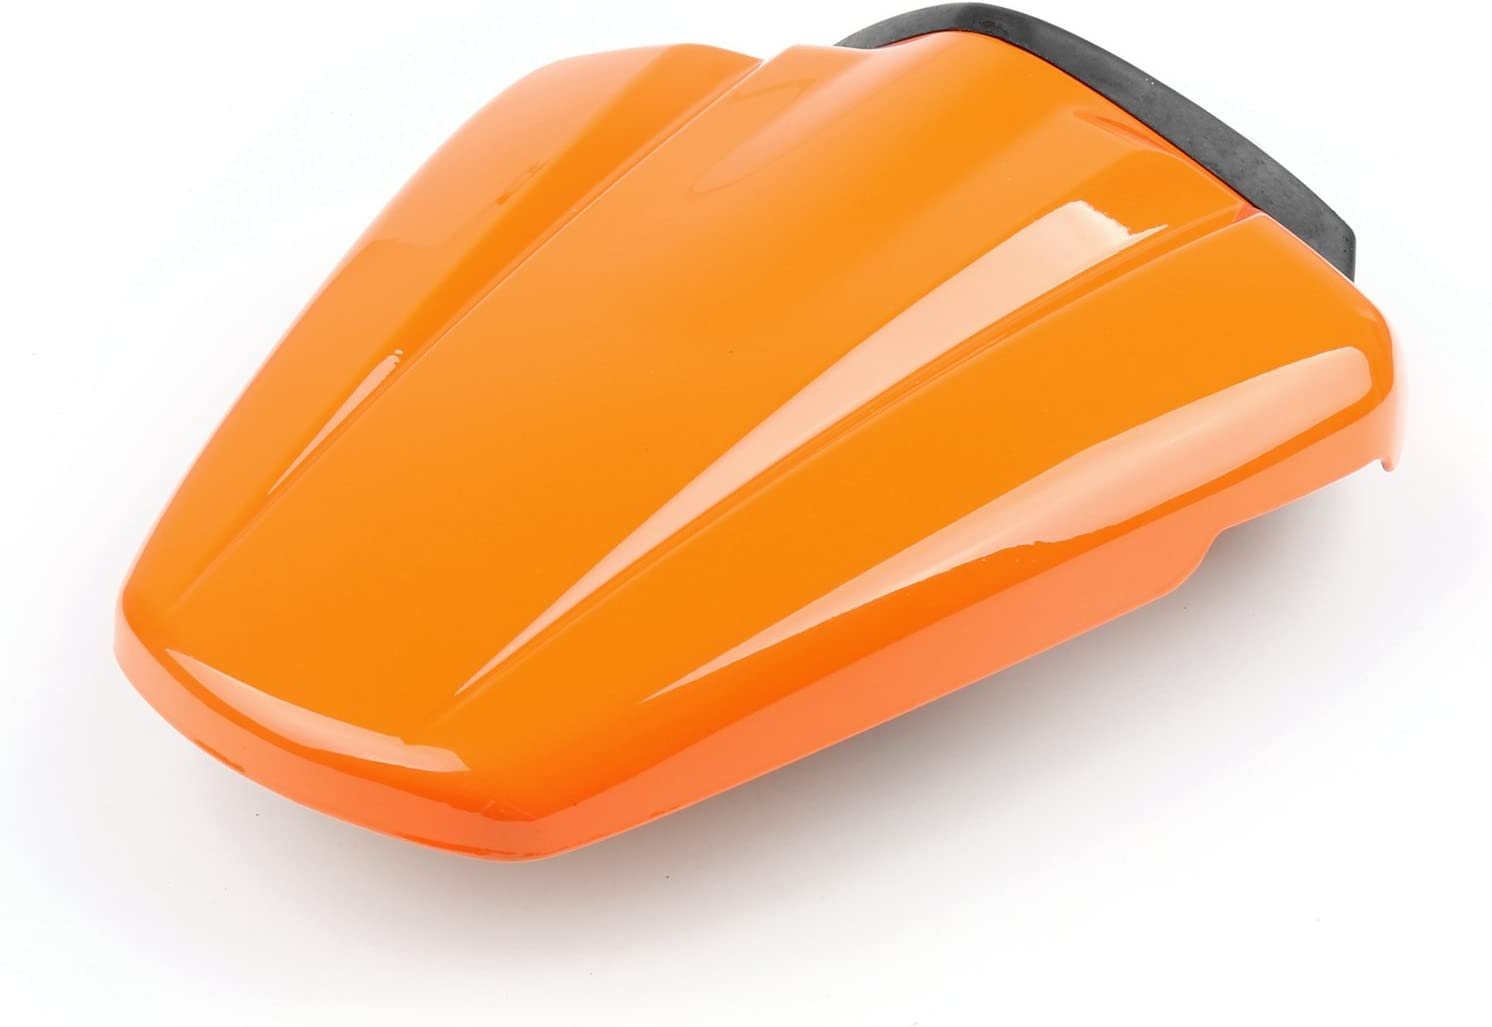 Artudatech Motorrad Soziusabdeckung Sitzkappe Verkleidung Heckabdeckung R/ücksitzbezug Rear Seat Cowl Fairing Tail Cover f/ür K-T-M 125 Duke 2011-2015 200 390 Duke 2012-2015